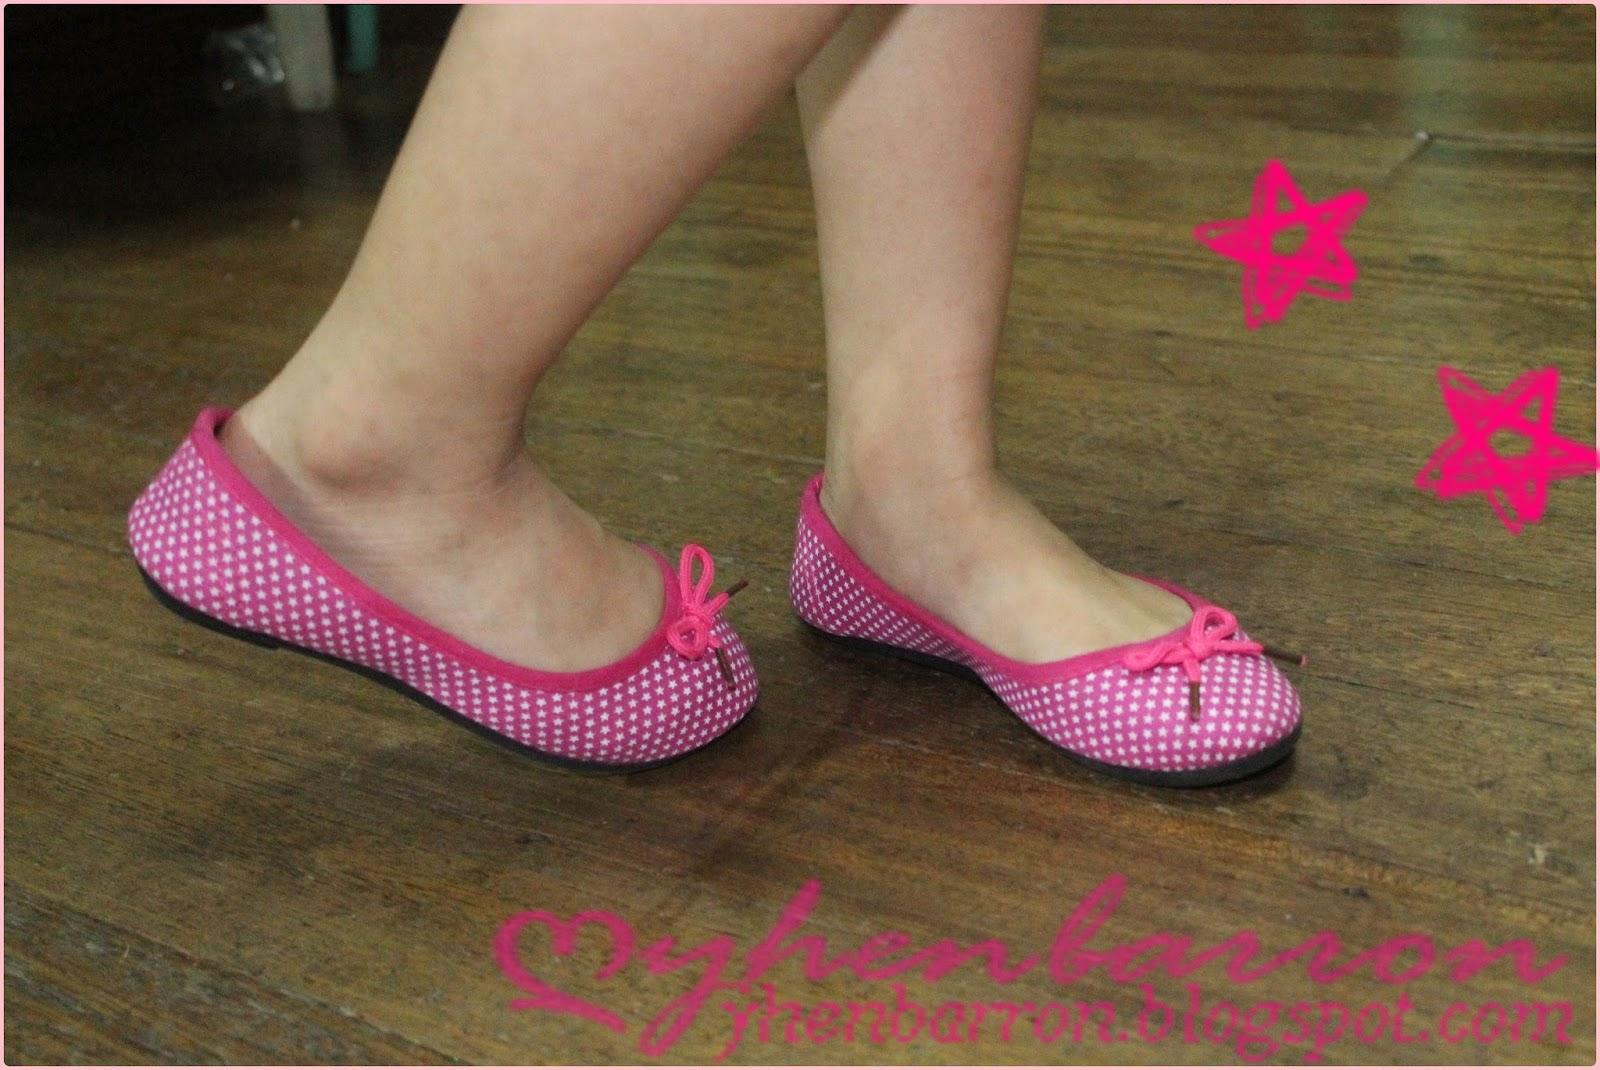 Girl Kids Feet , Kids Shoes , Kids Feet Webshots , Kids Feet Walking